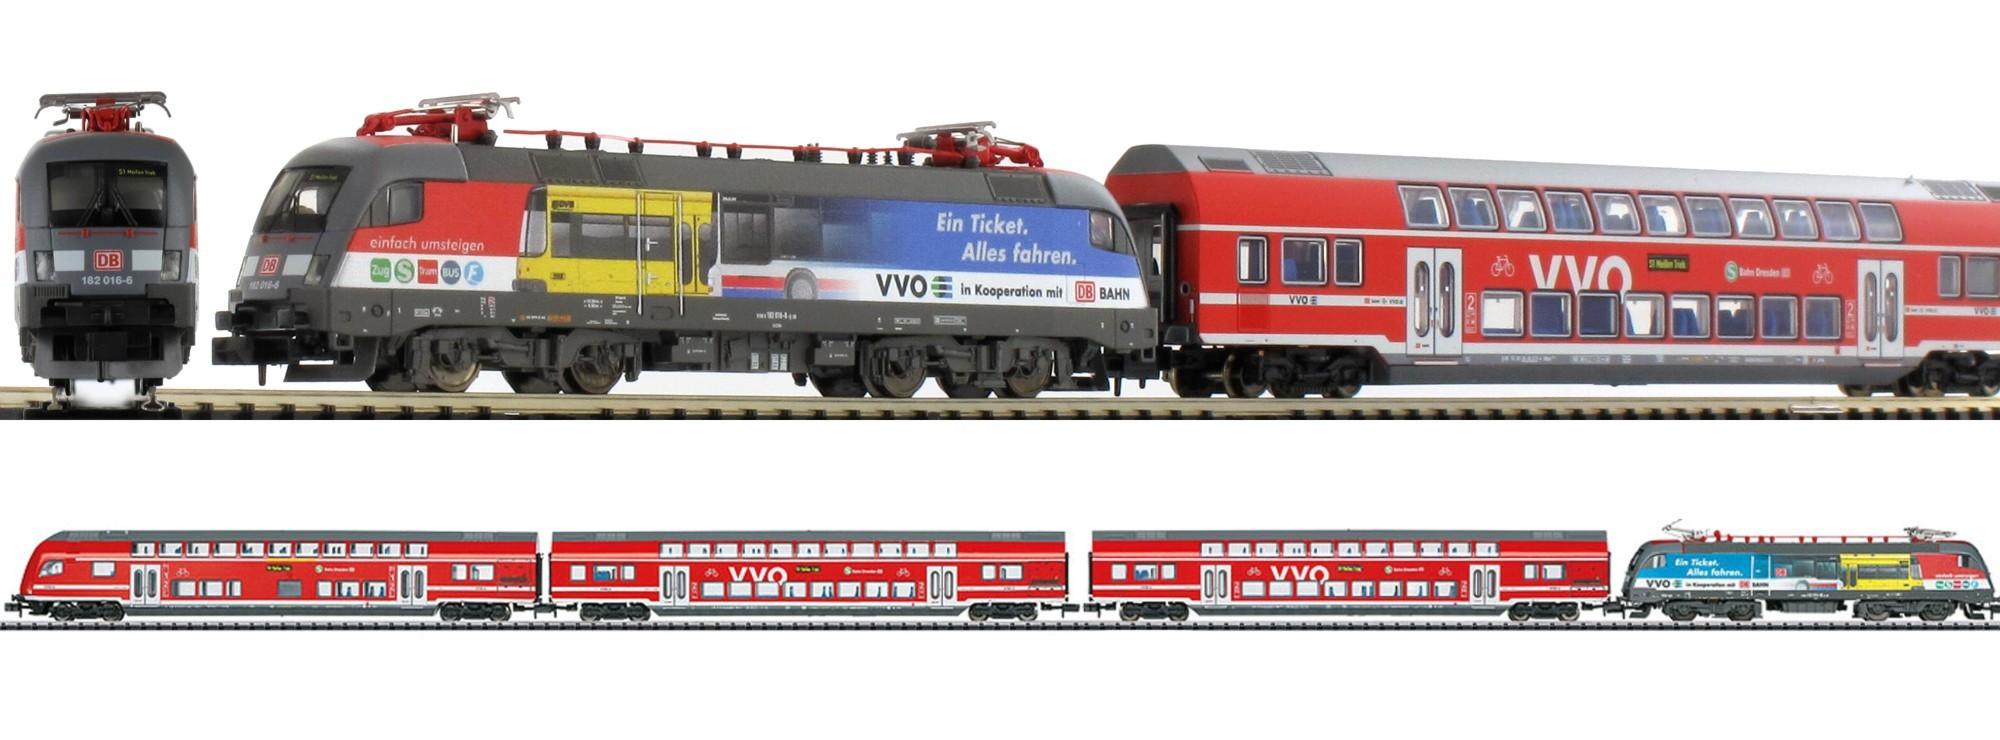 N Scale - Minitrix - 11630 - Passenger Train, Electric, Europe, Epoch VI - VVO (Dresden S-Bahn) - 4-Pack